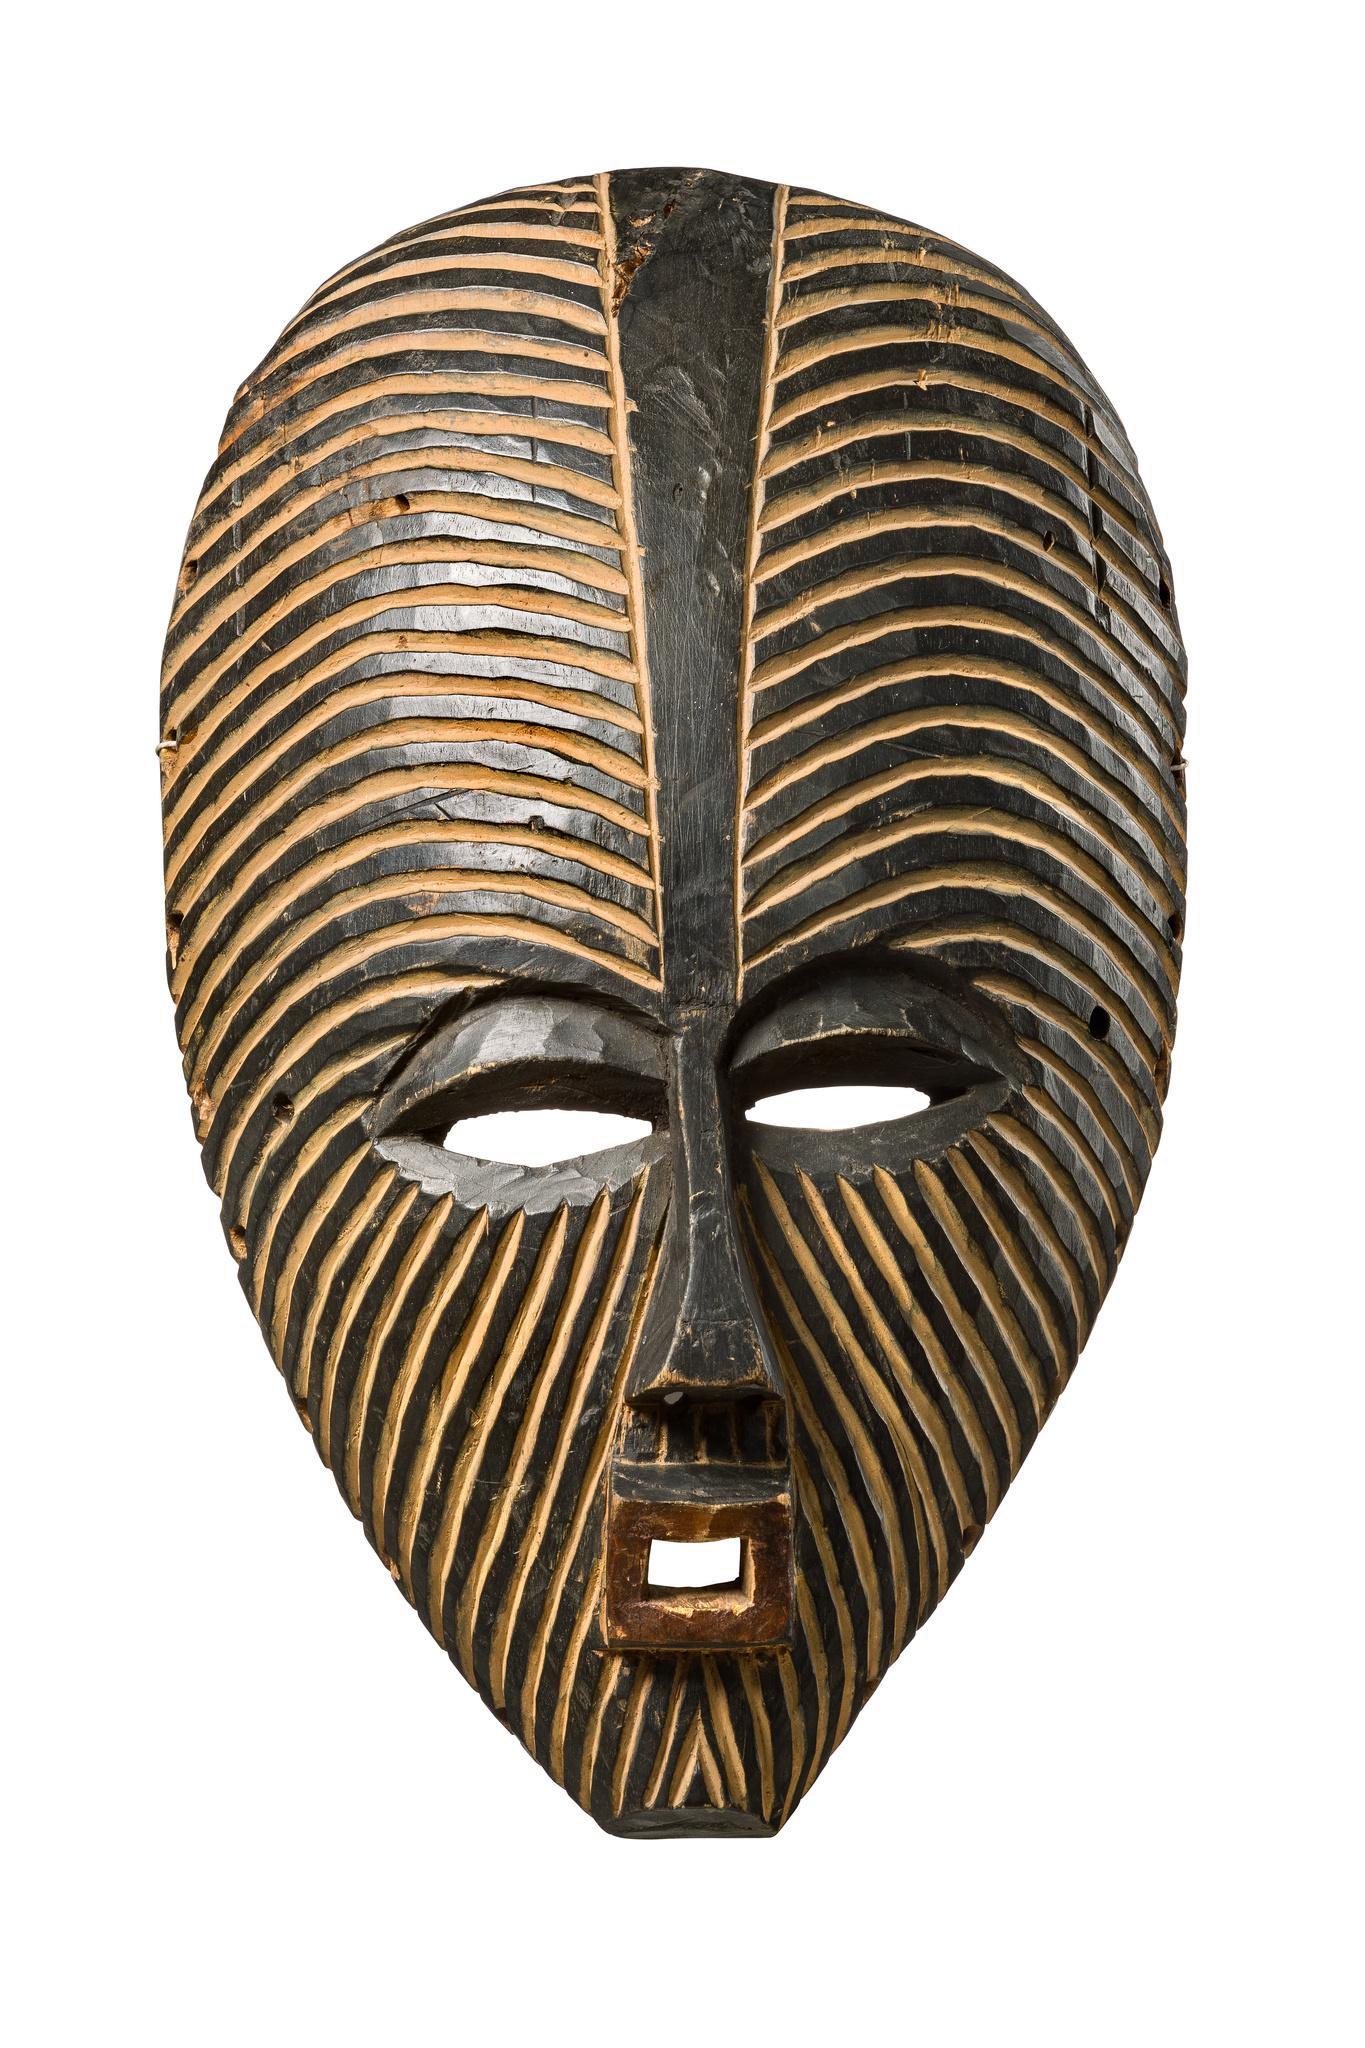 Anthropomorphic face mask